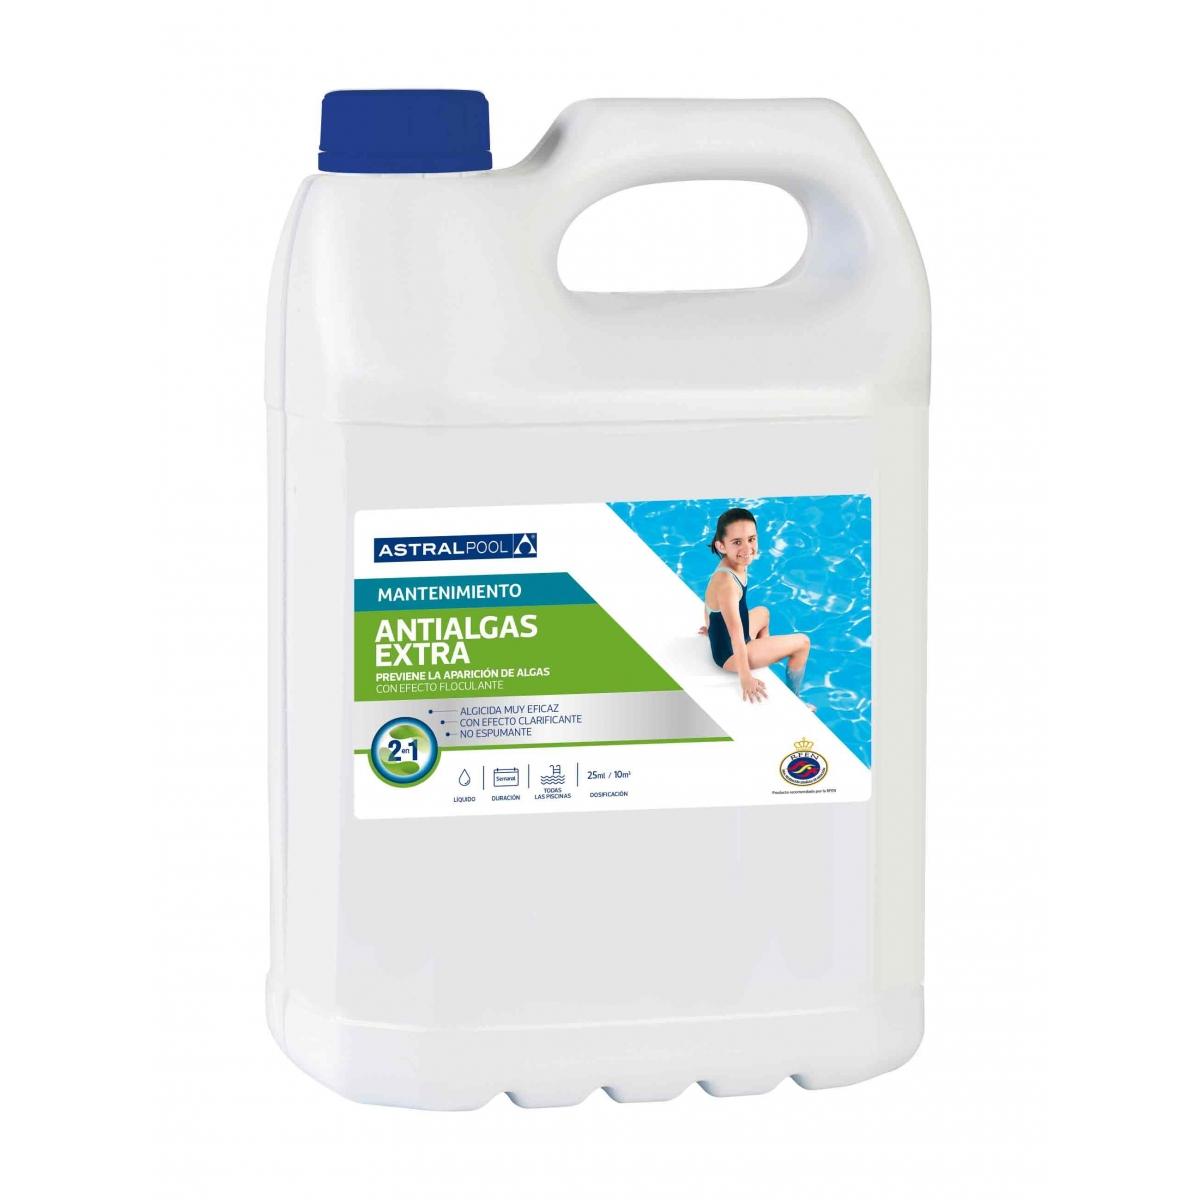 Antialgas Extra